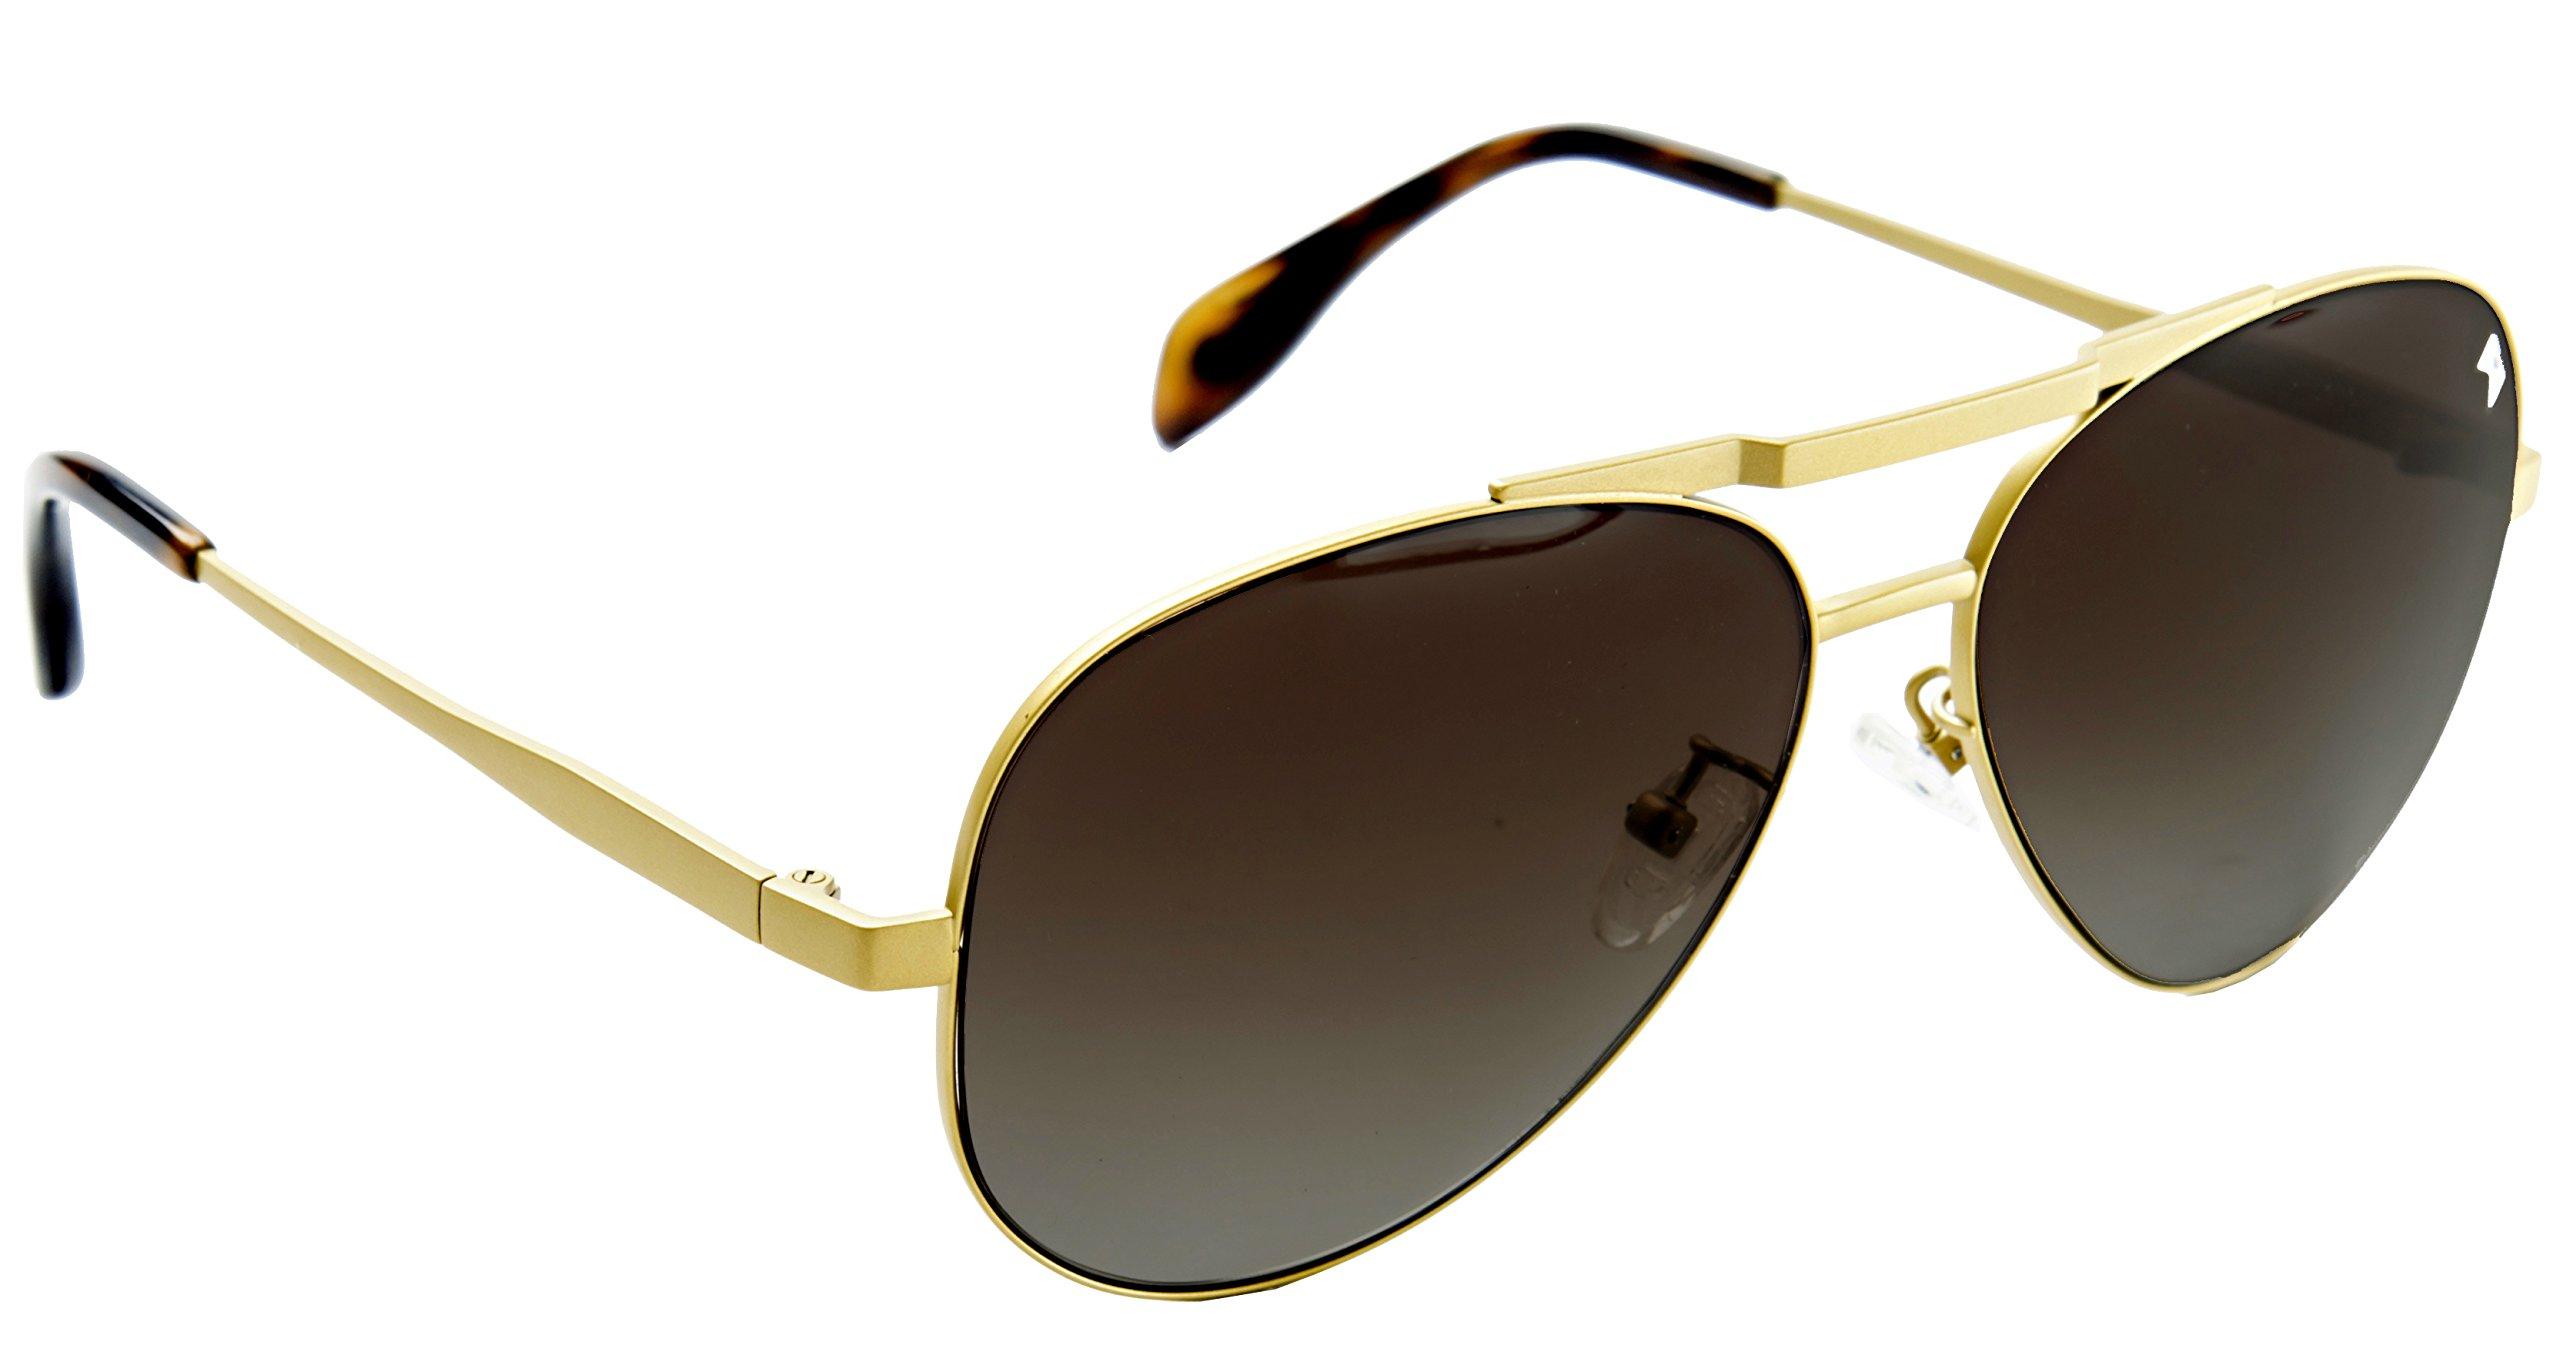 William Painter Gold Aviator Sunglasses with Aerospace Grade Titanium & Nylon Polarized Lenses, The Hughes by William Painter